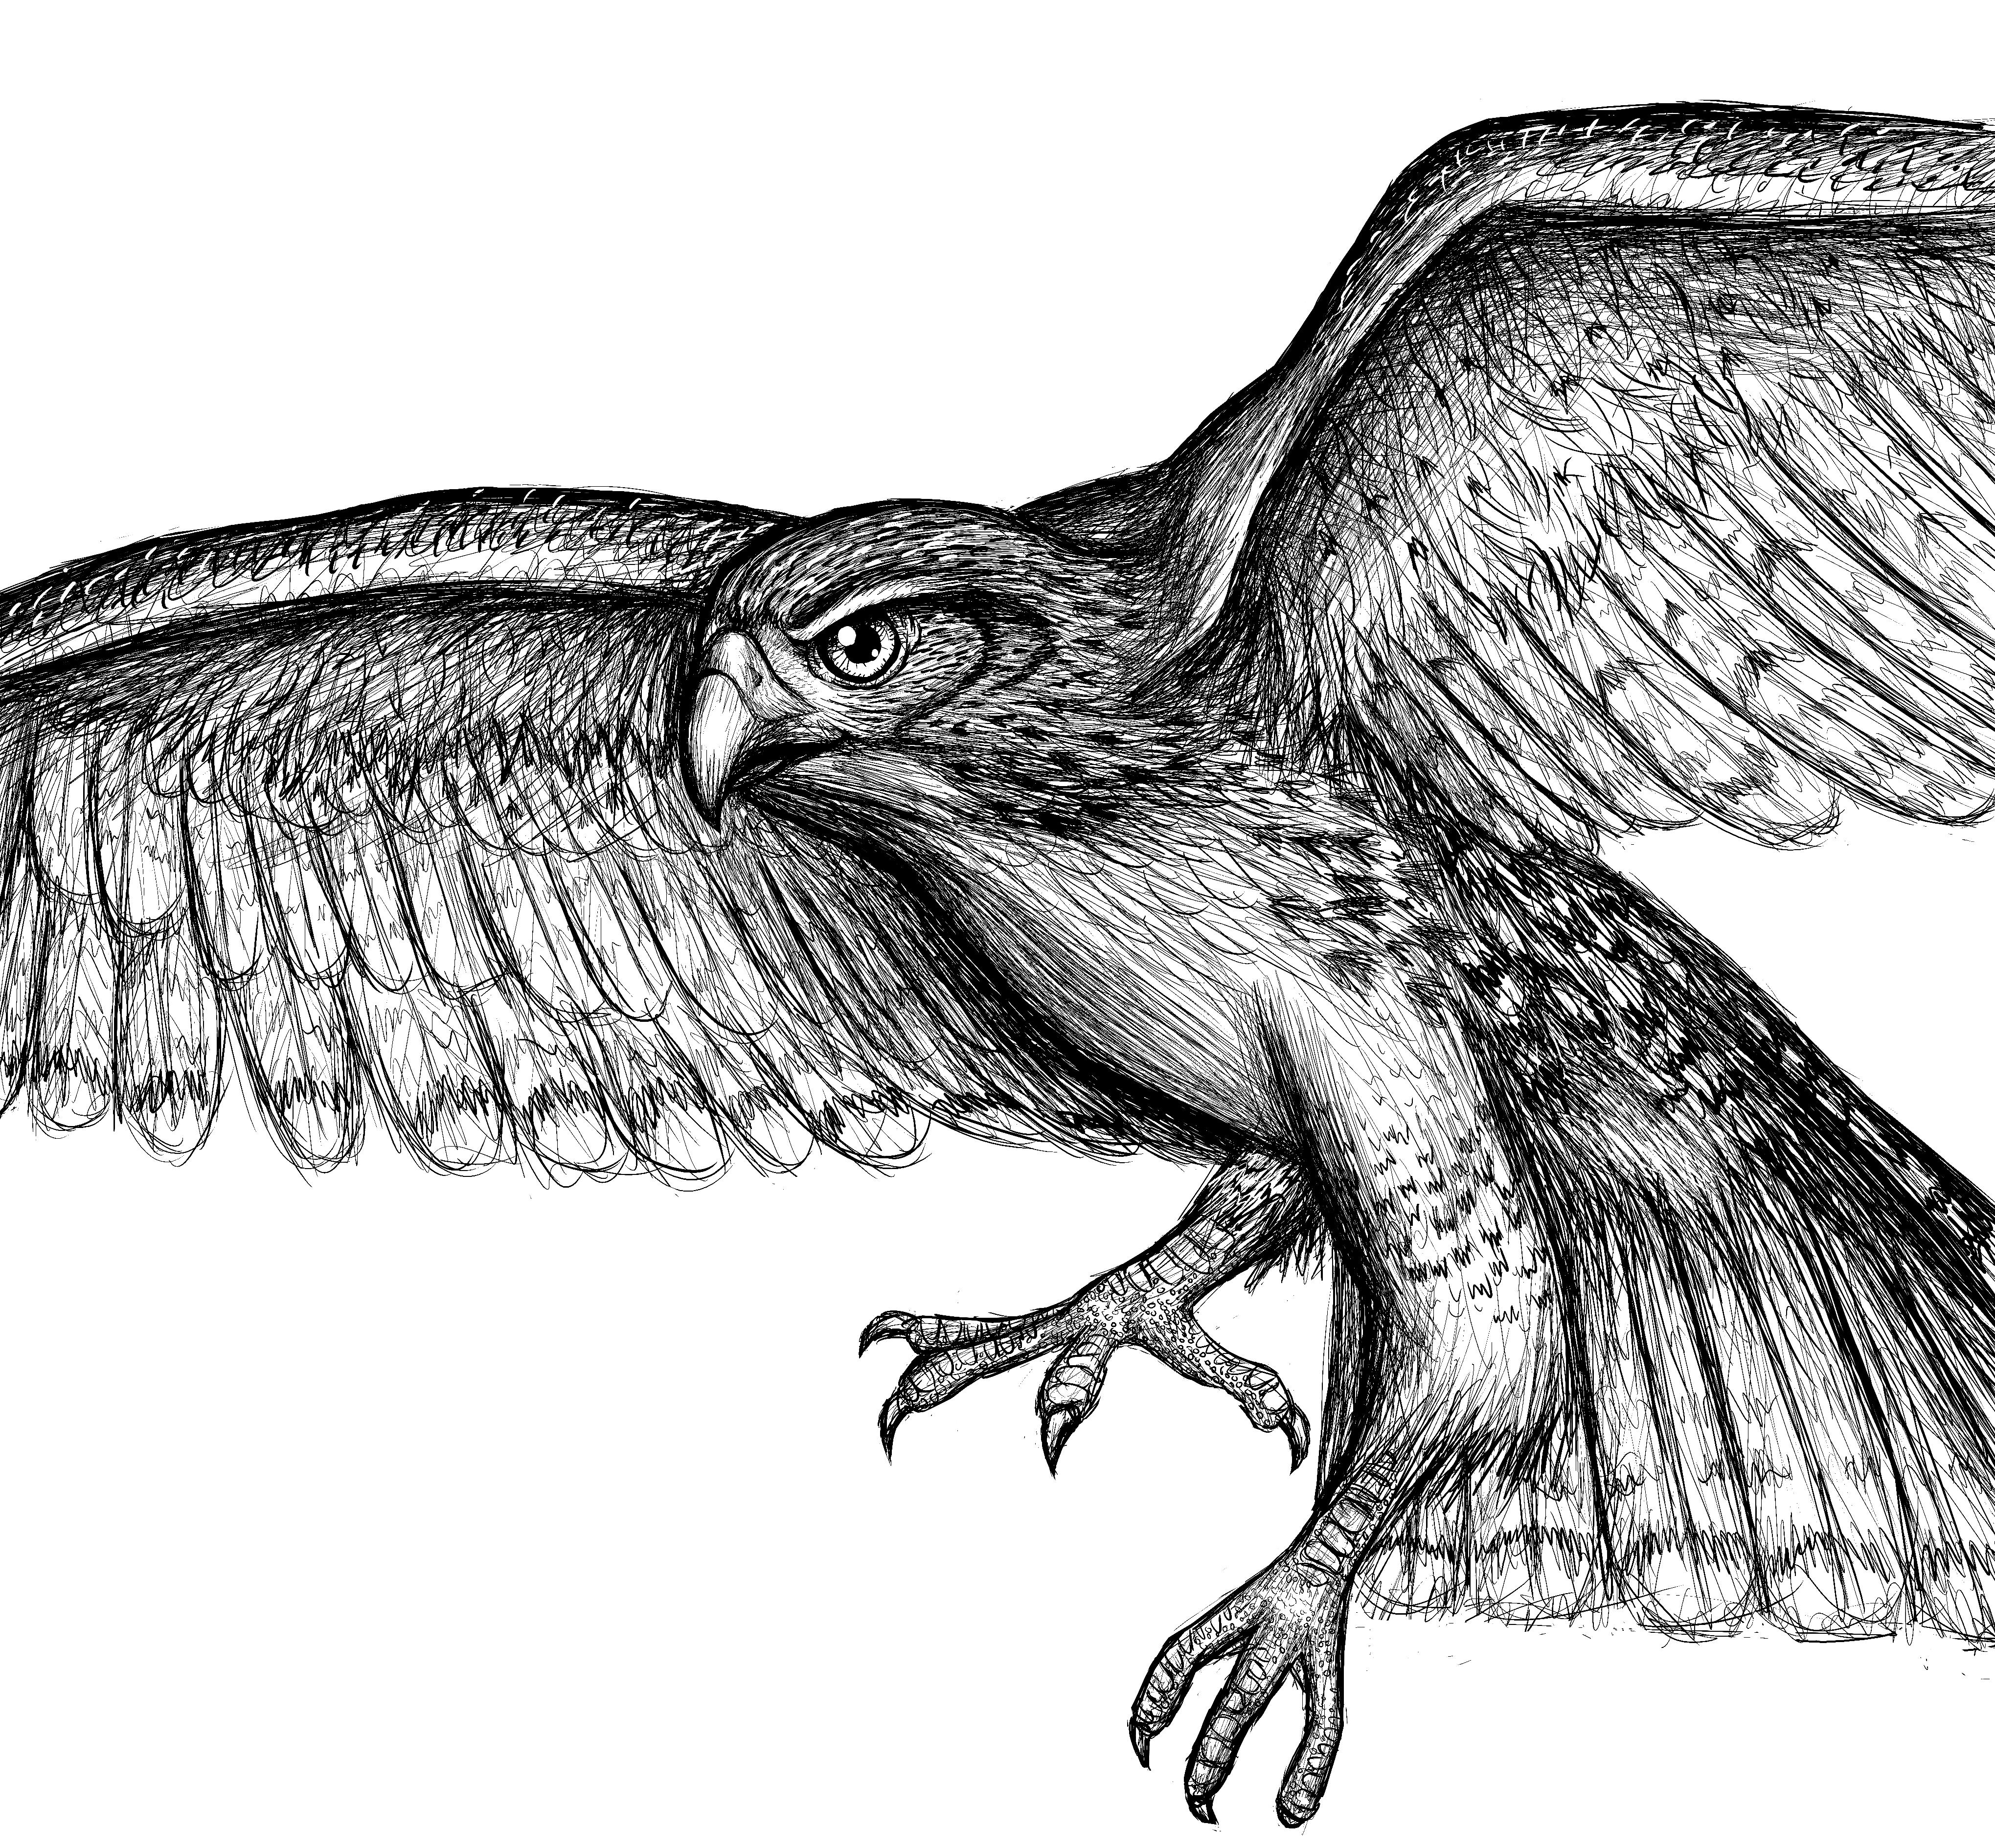 Cool Bird Drawings | Www.imgkid.com - The Image Kid Has It!